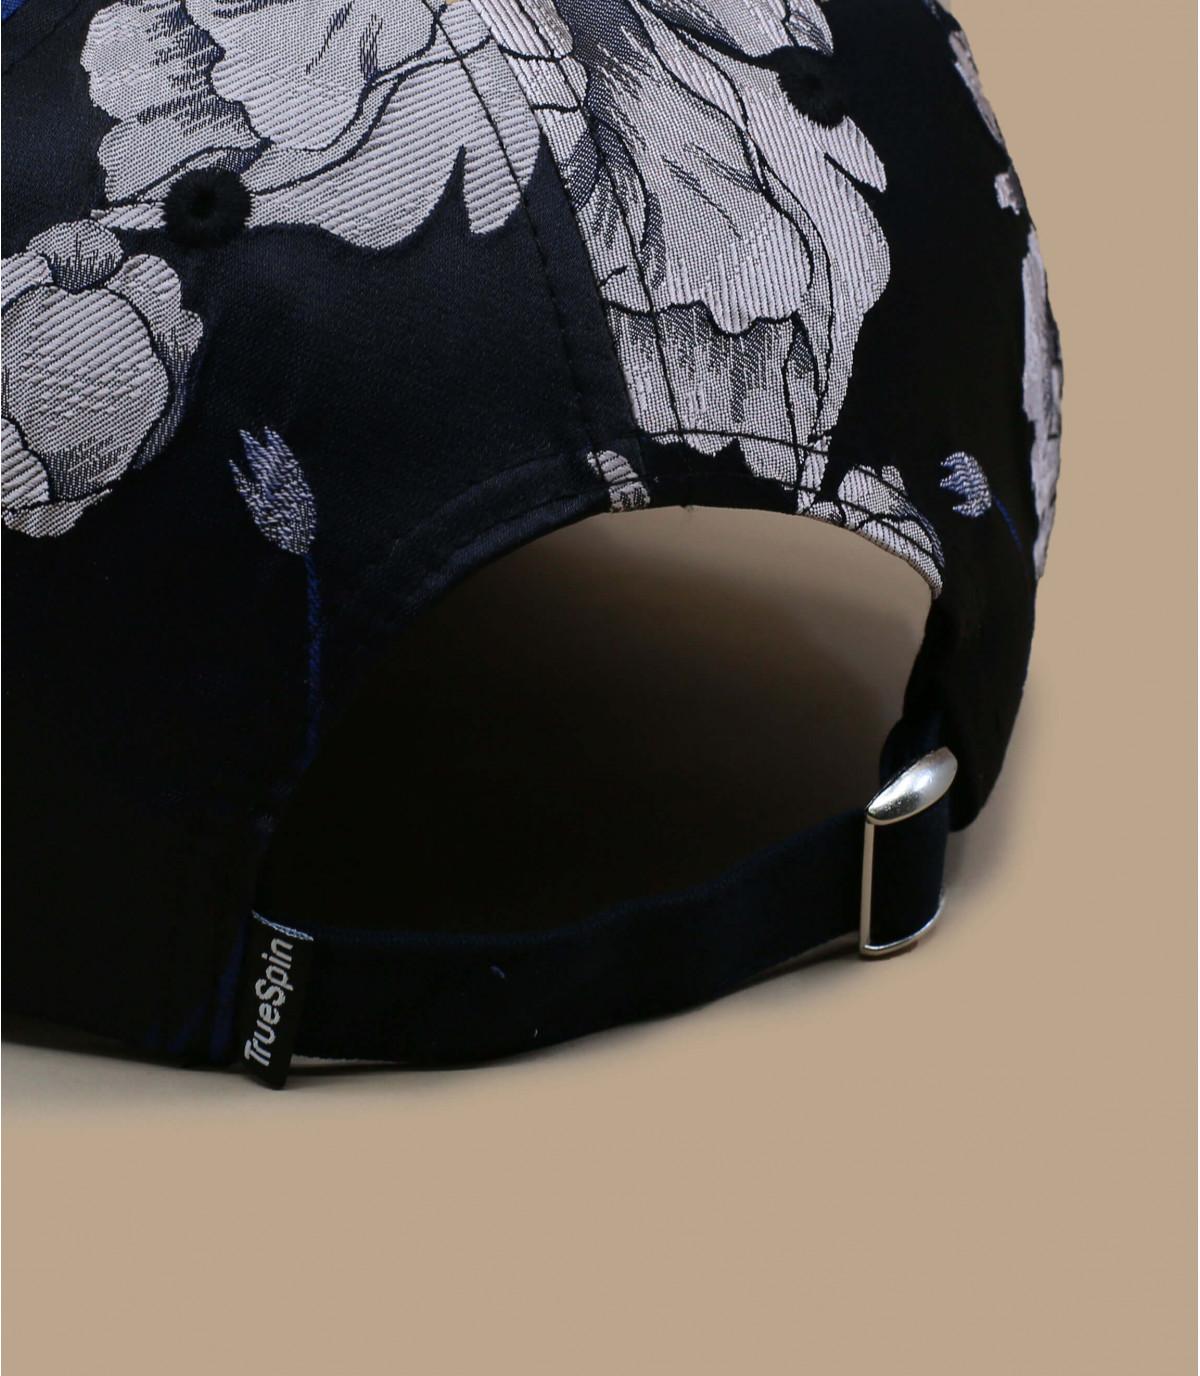 Details Adrian floral navy - afbeeling 3